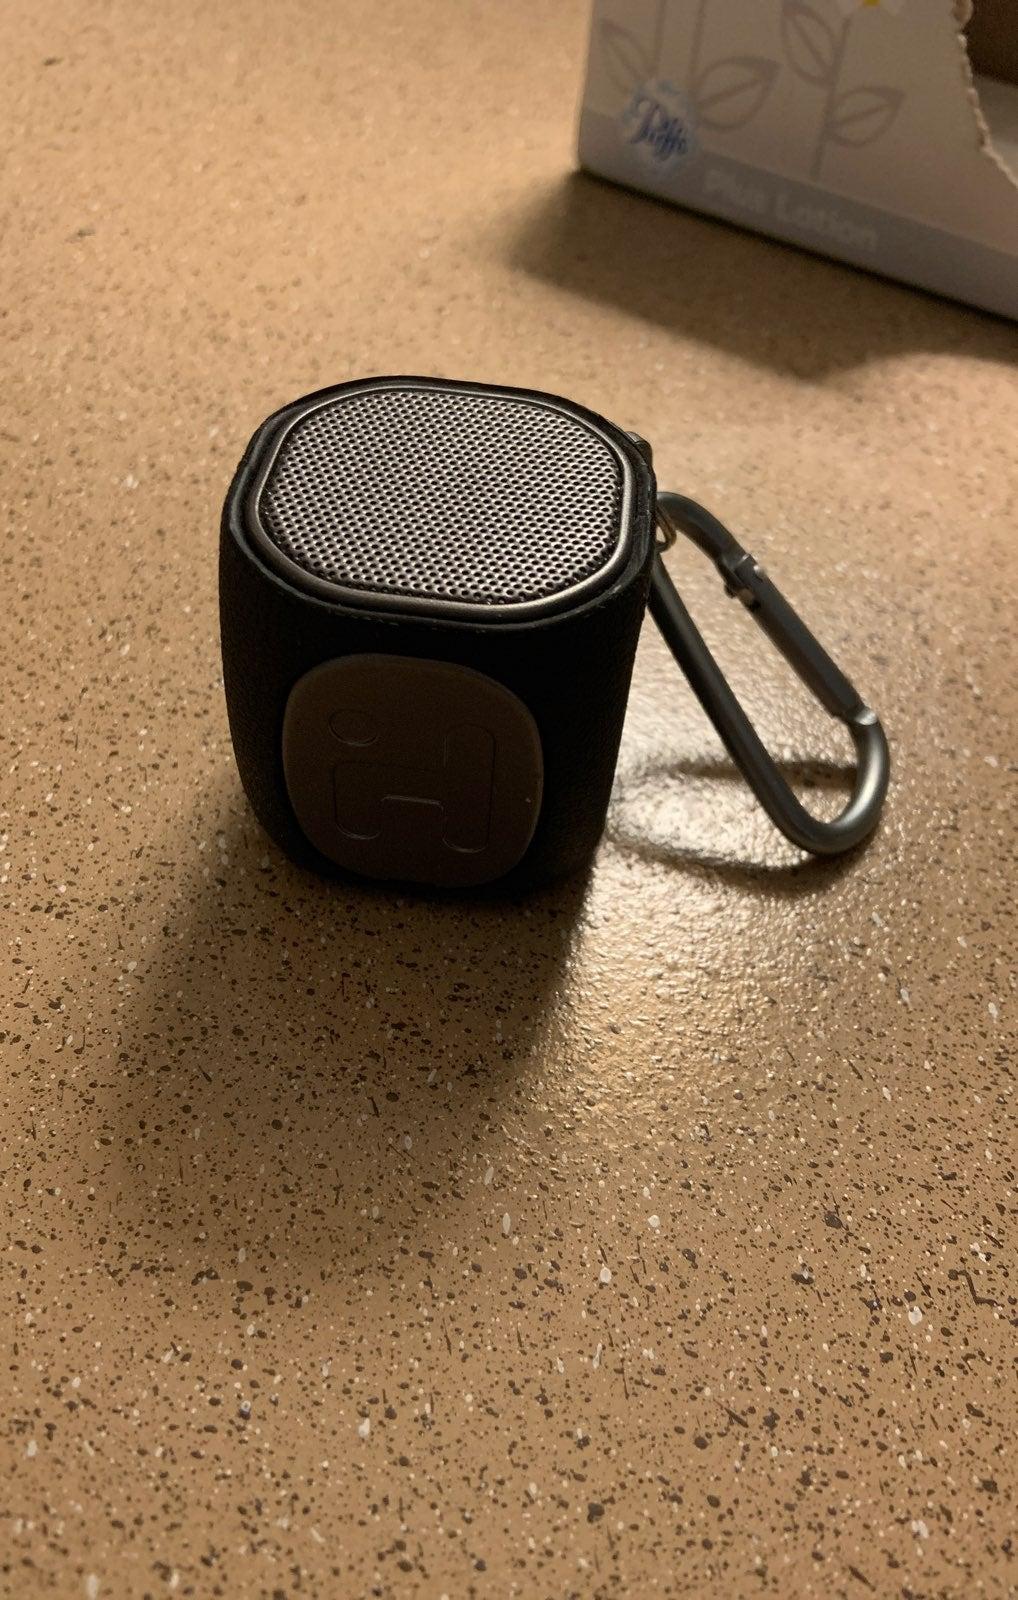 ihome portable speaker